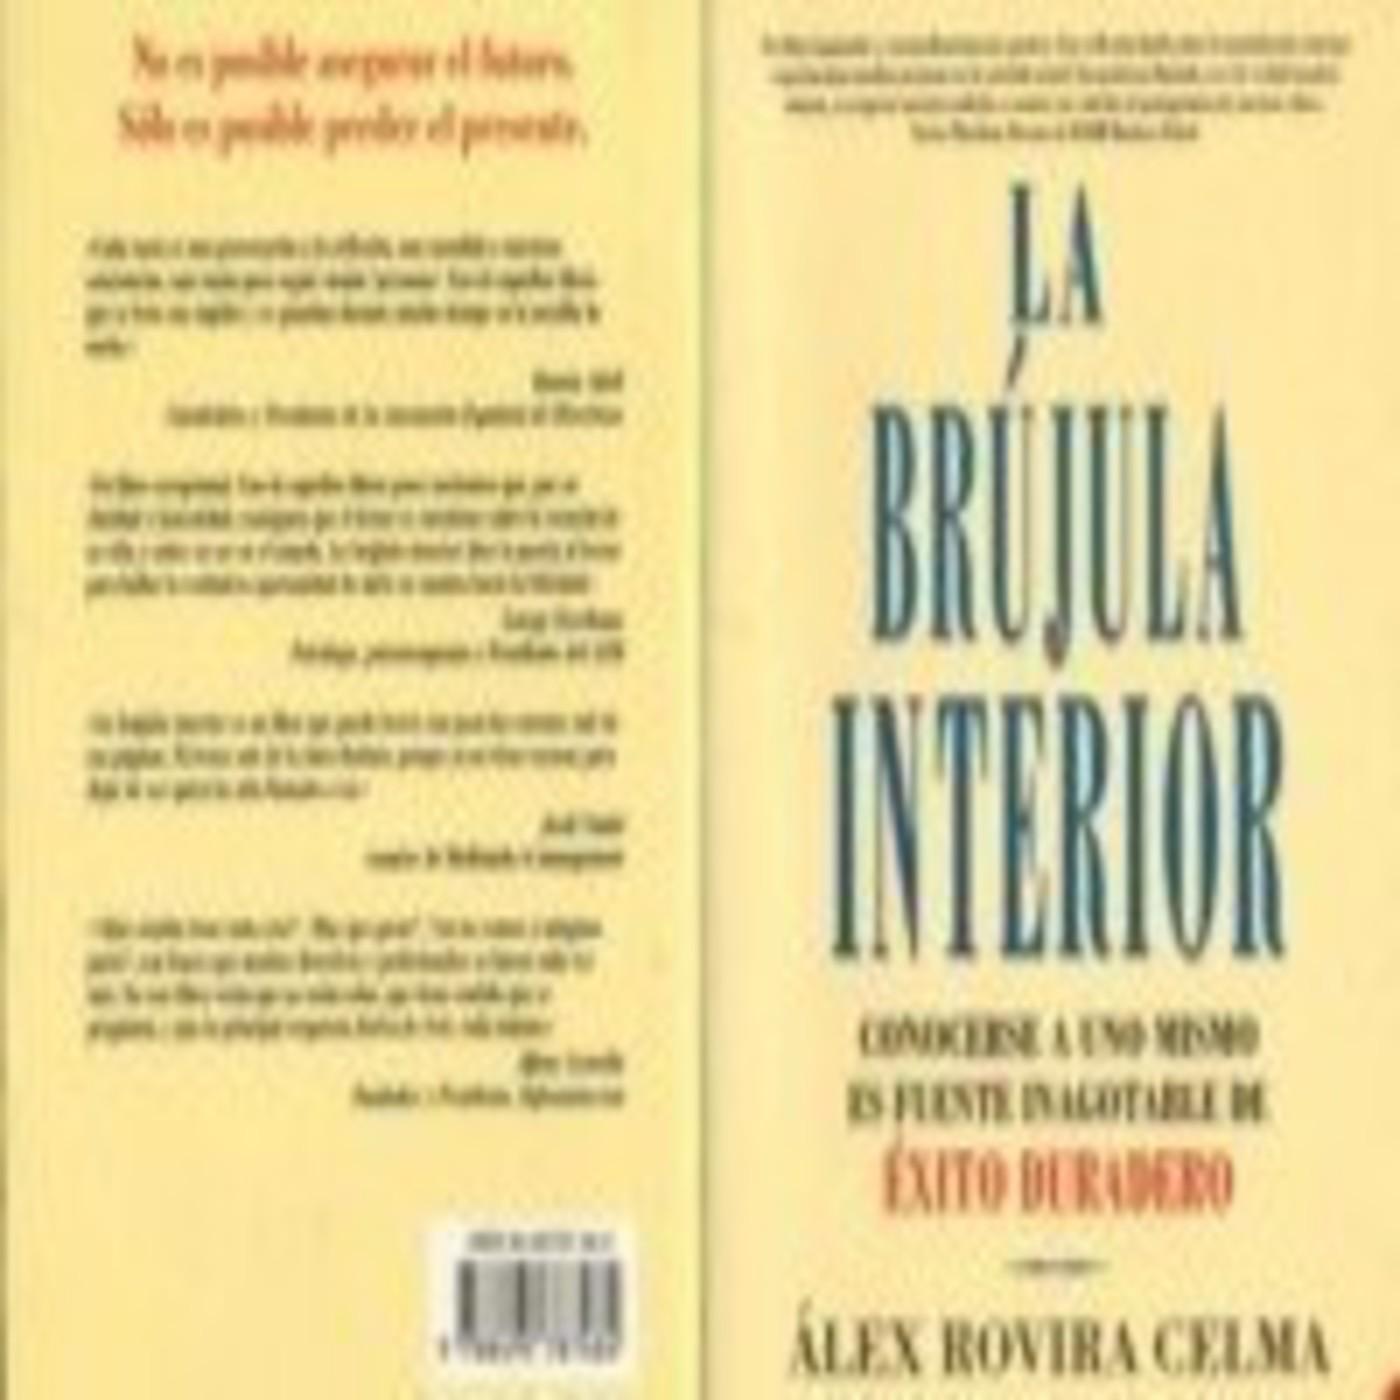 La Brújula Interior de Alex Rovira